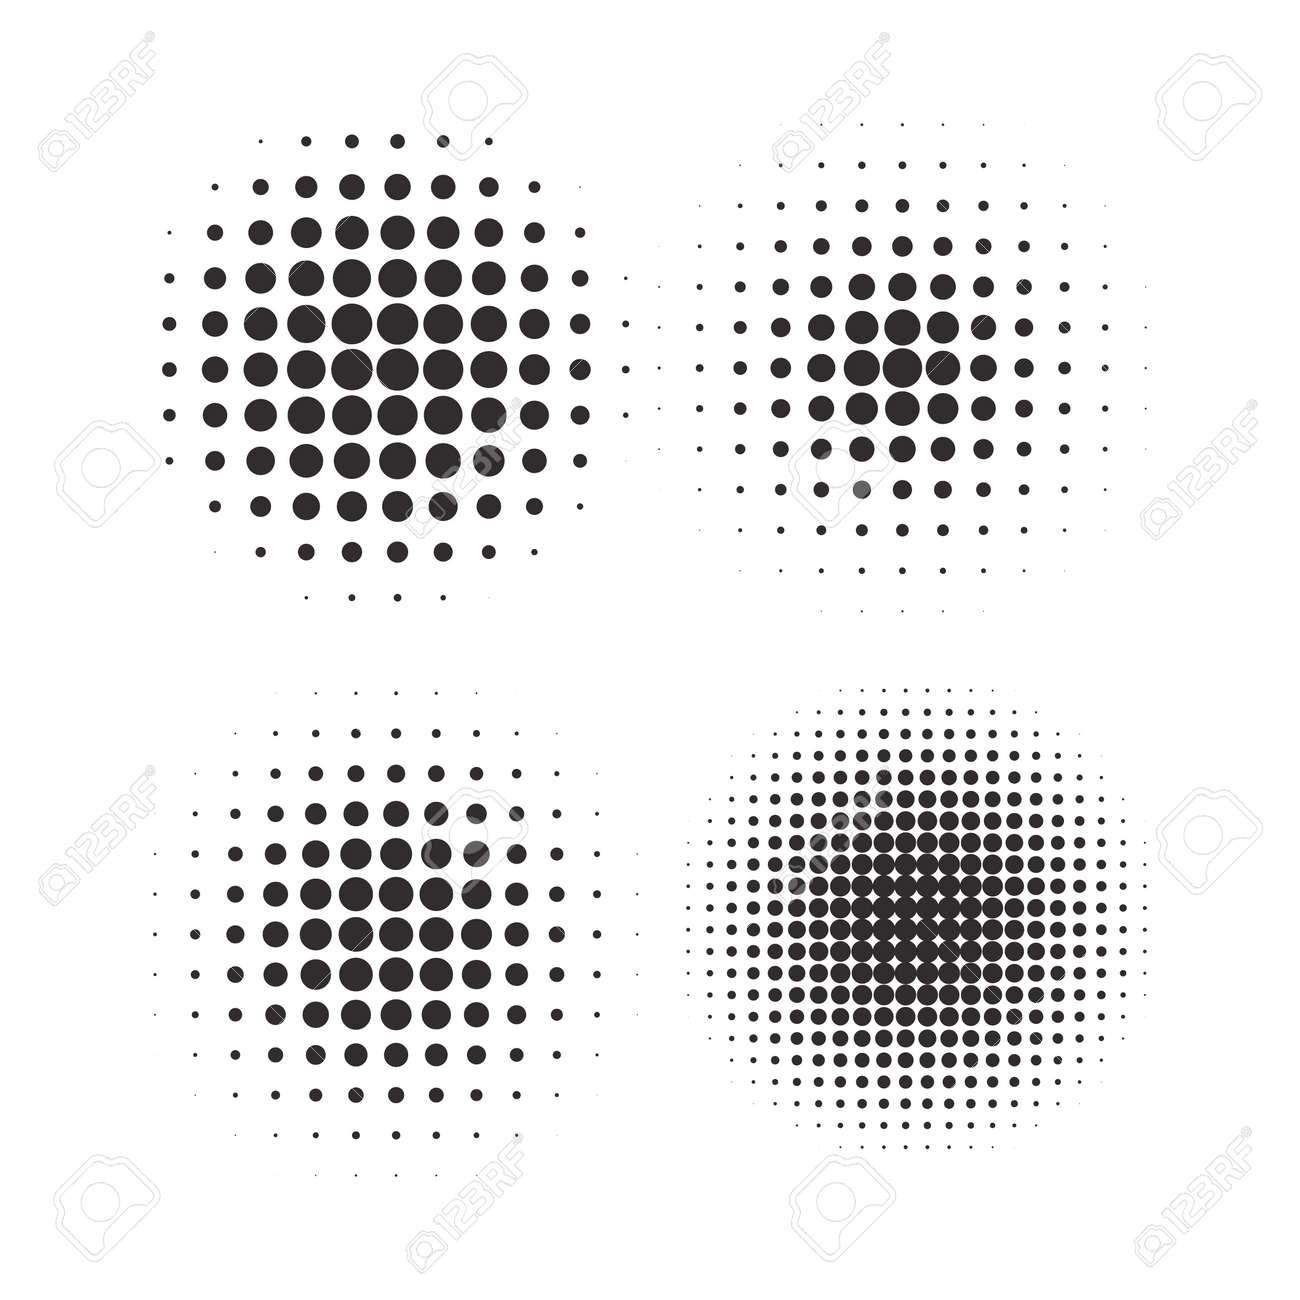 Halftone circles, halftone dot pattern texture set on white background - 170654857